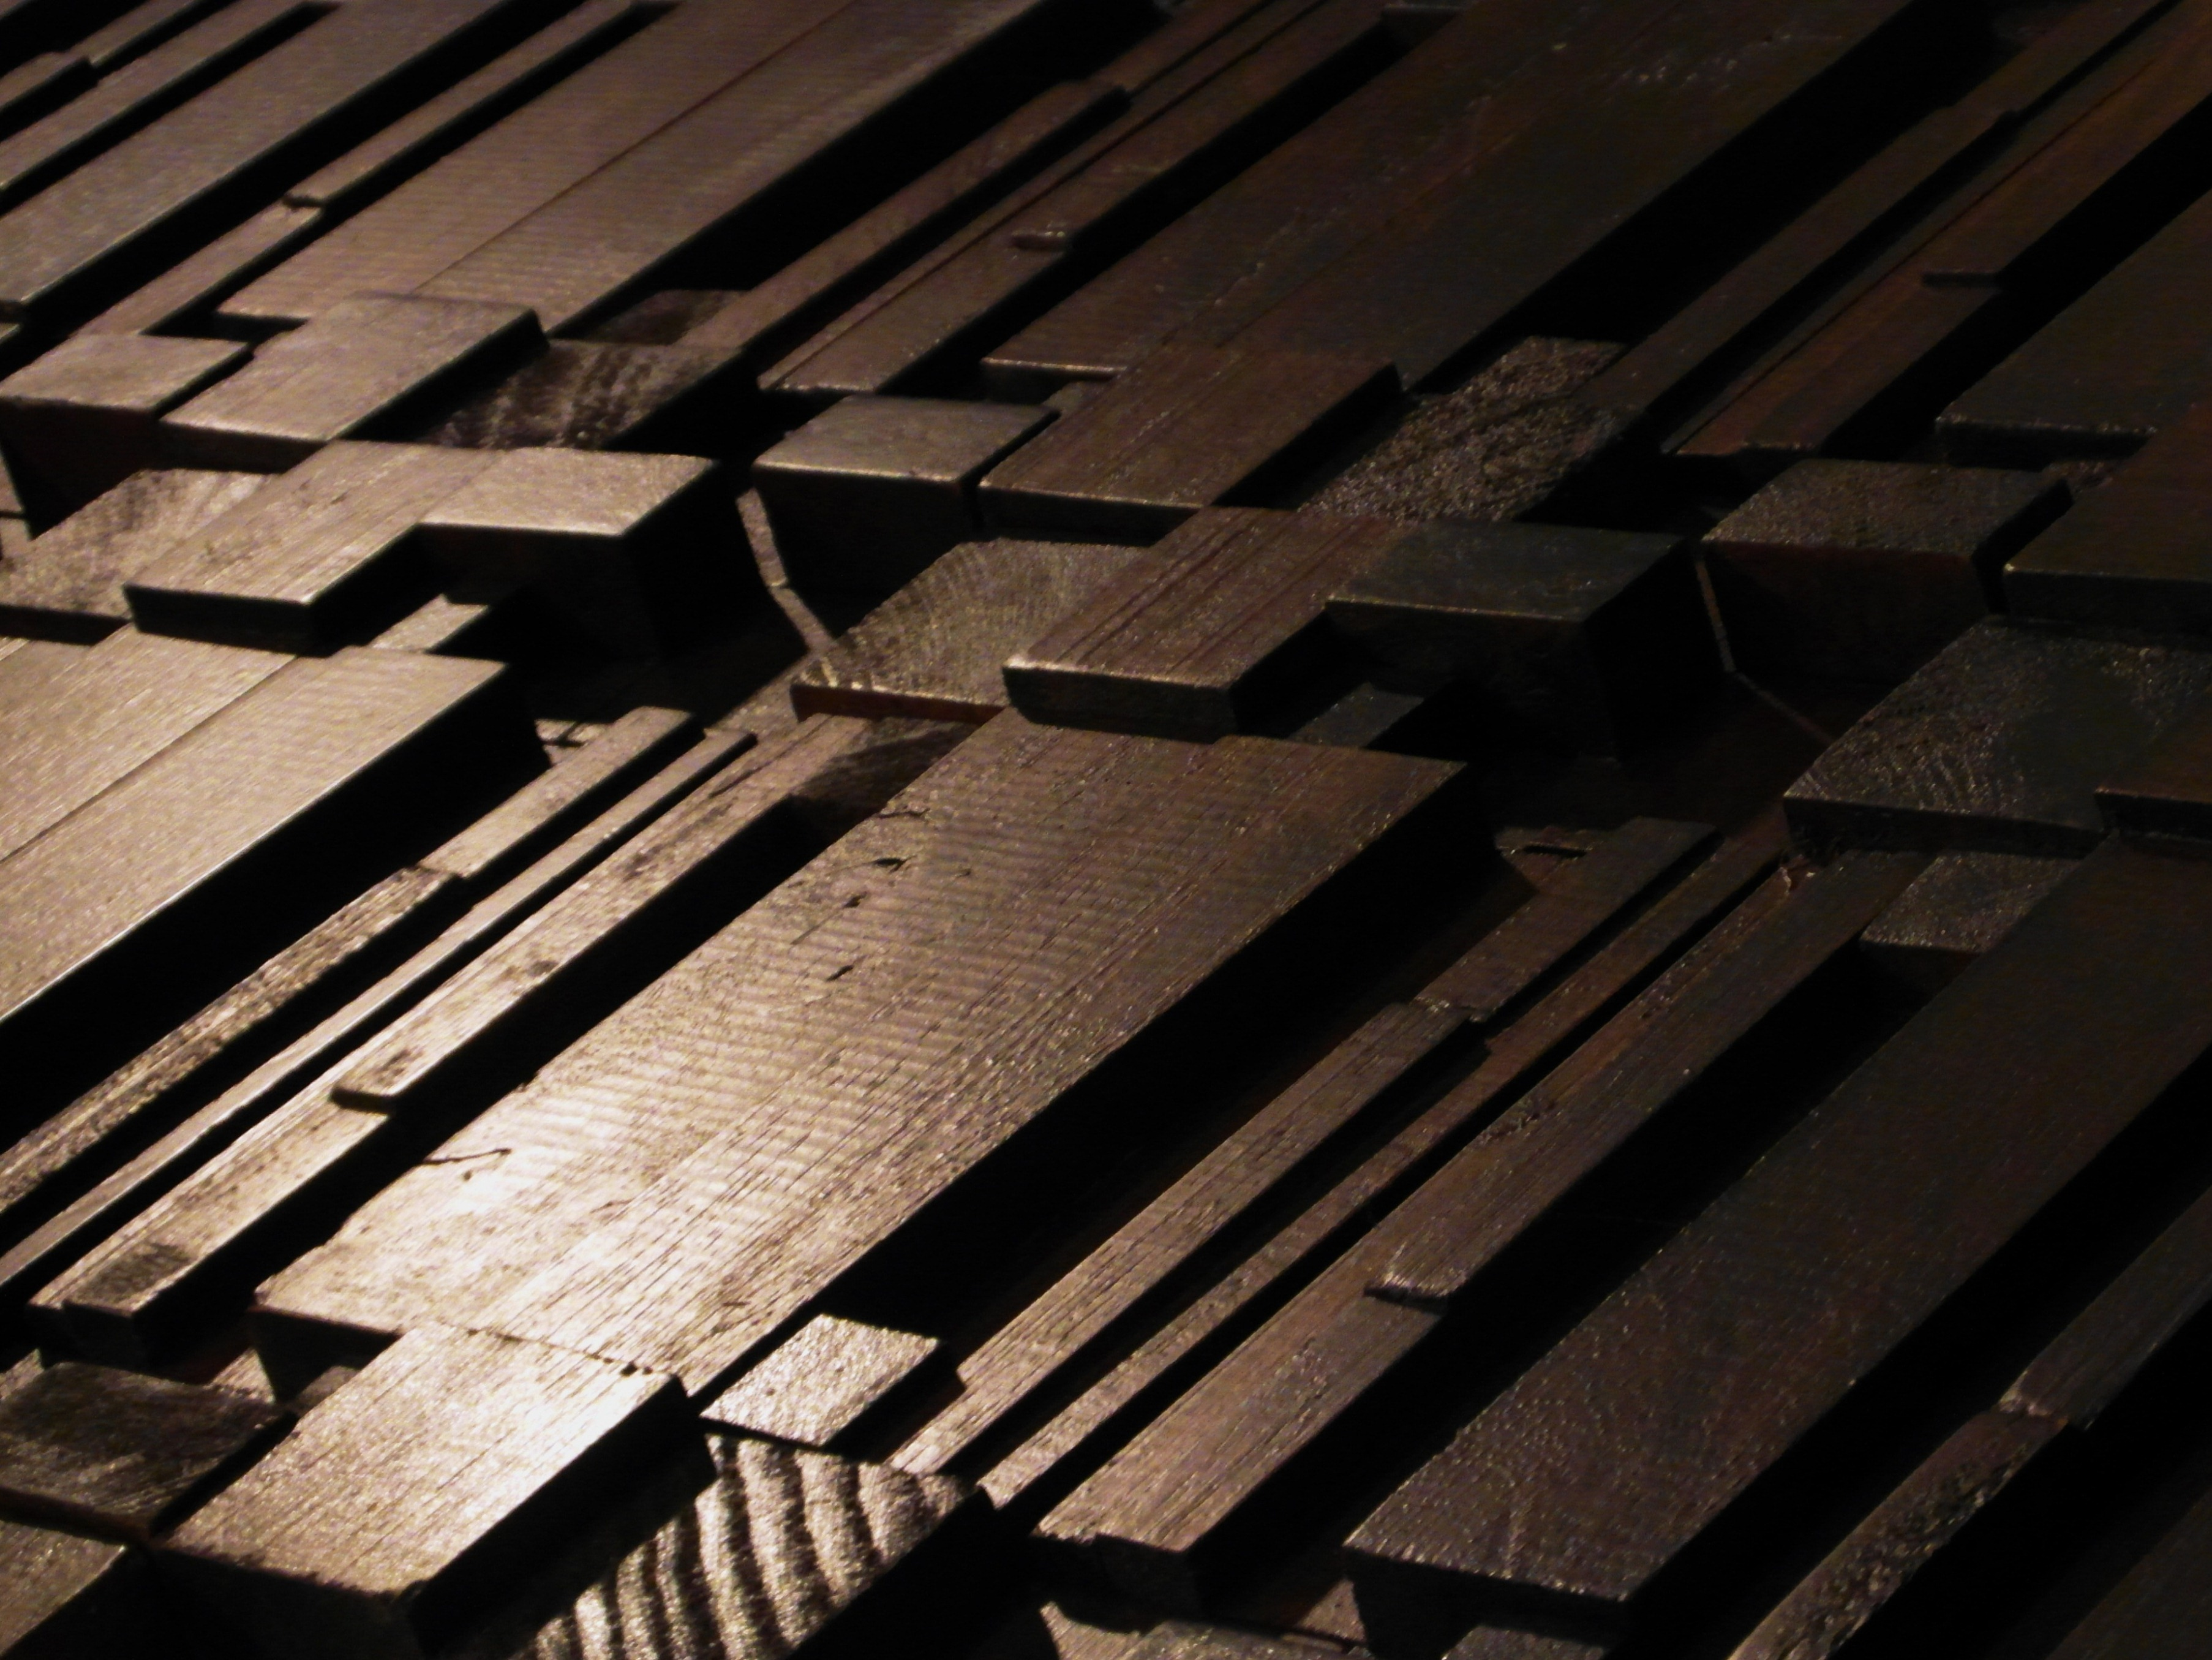 Abstract Wooden Blocks, Abstract, Teak, Original, Panel, HQ Photo